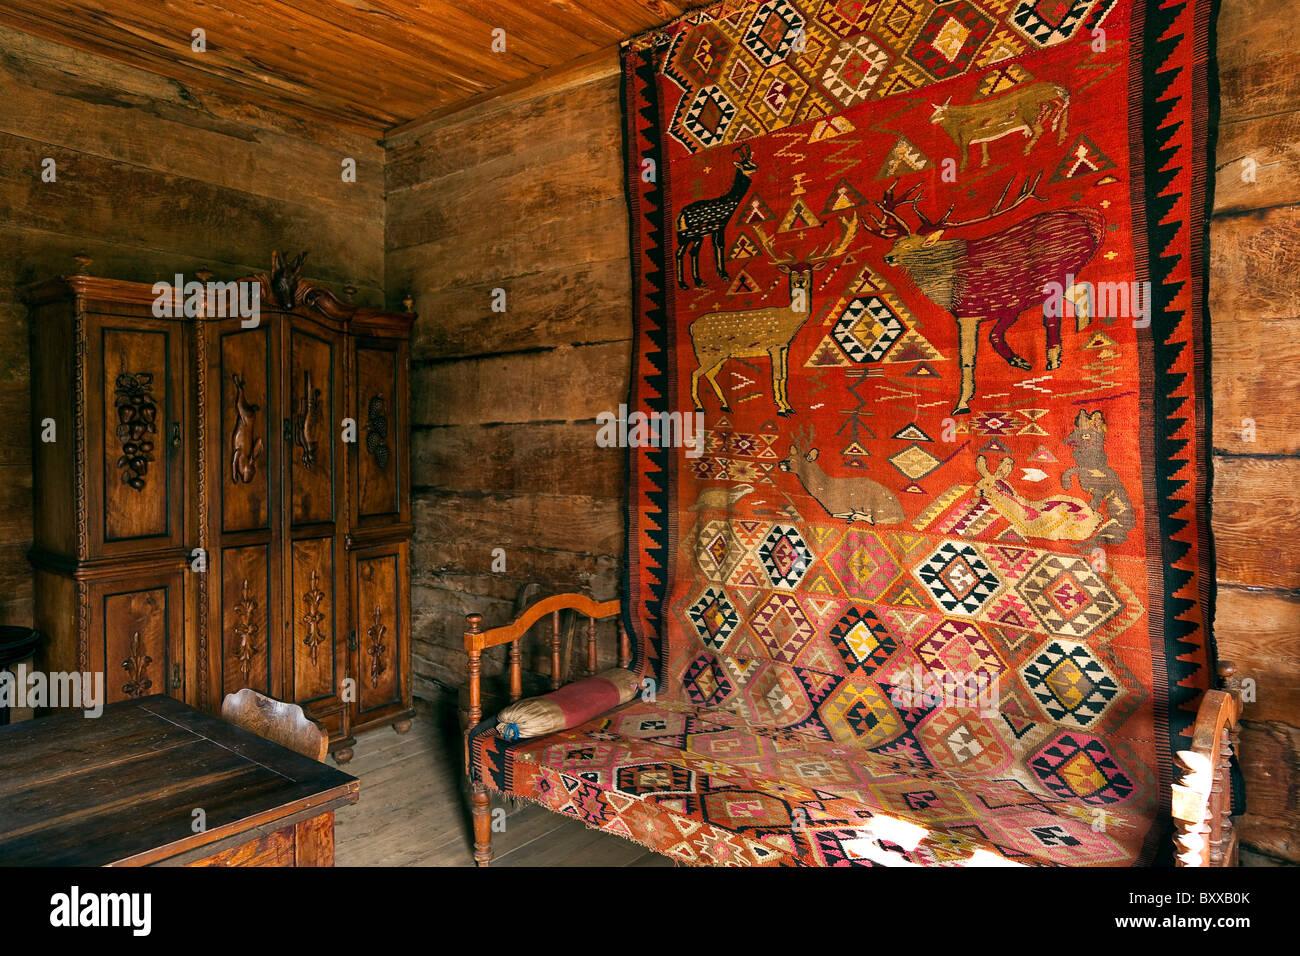 The Giorgi Chitaia Open Air Museum of Ethnography, Tbilisi, Georgia. JMH4097 - Stock Image